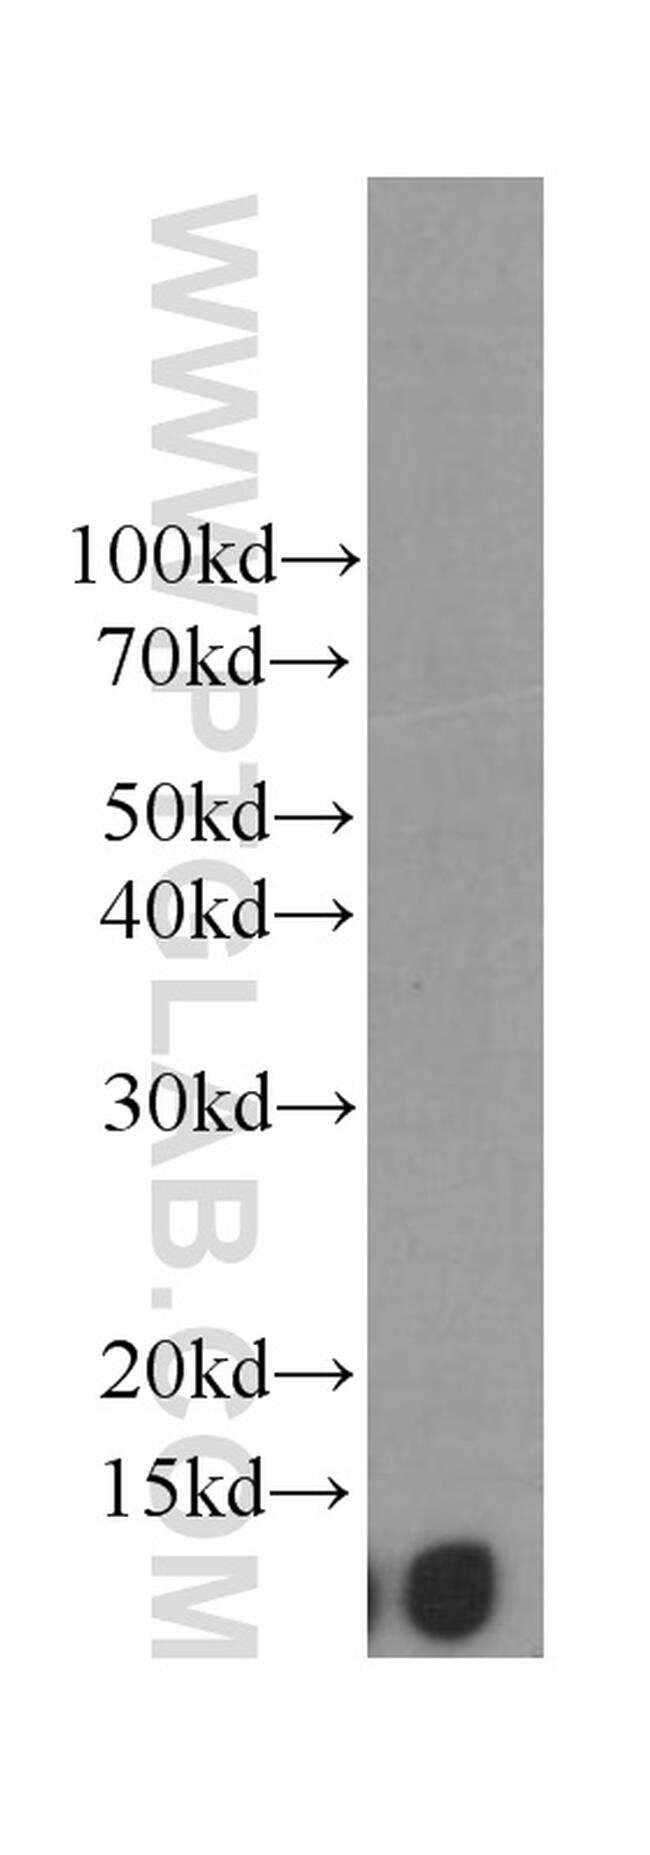 Beta-2-microglobulin Antibody in Western Blot (WB)